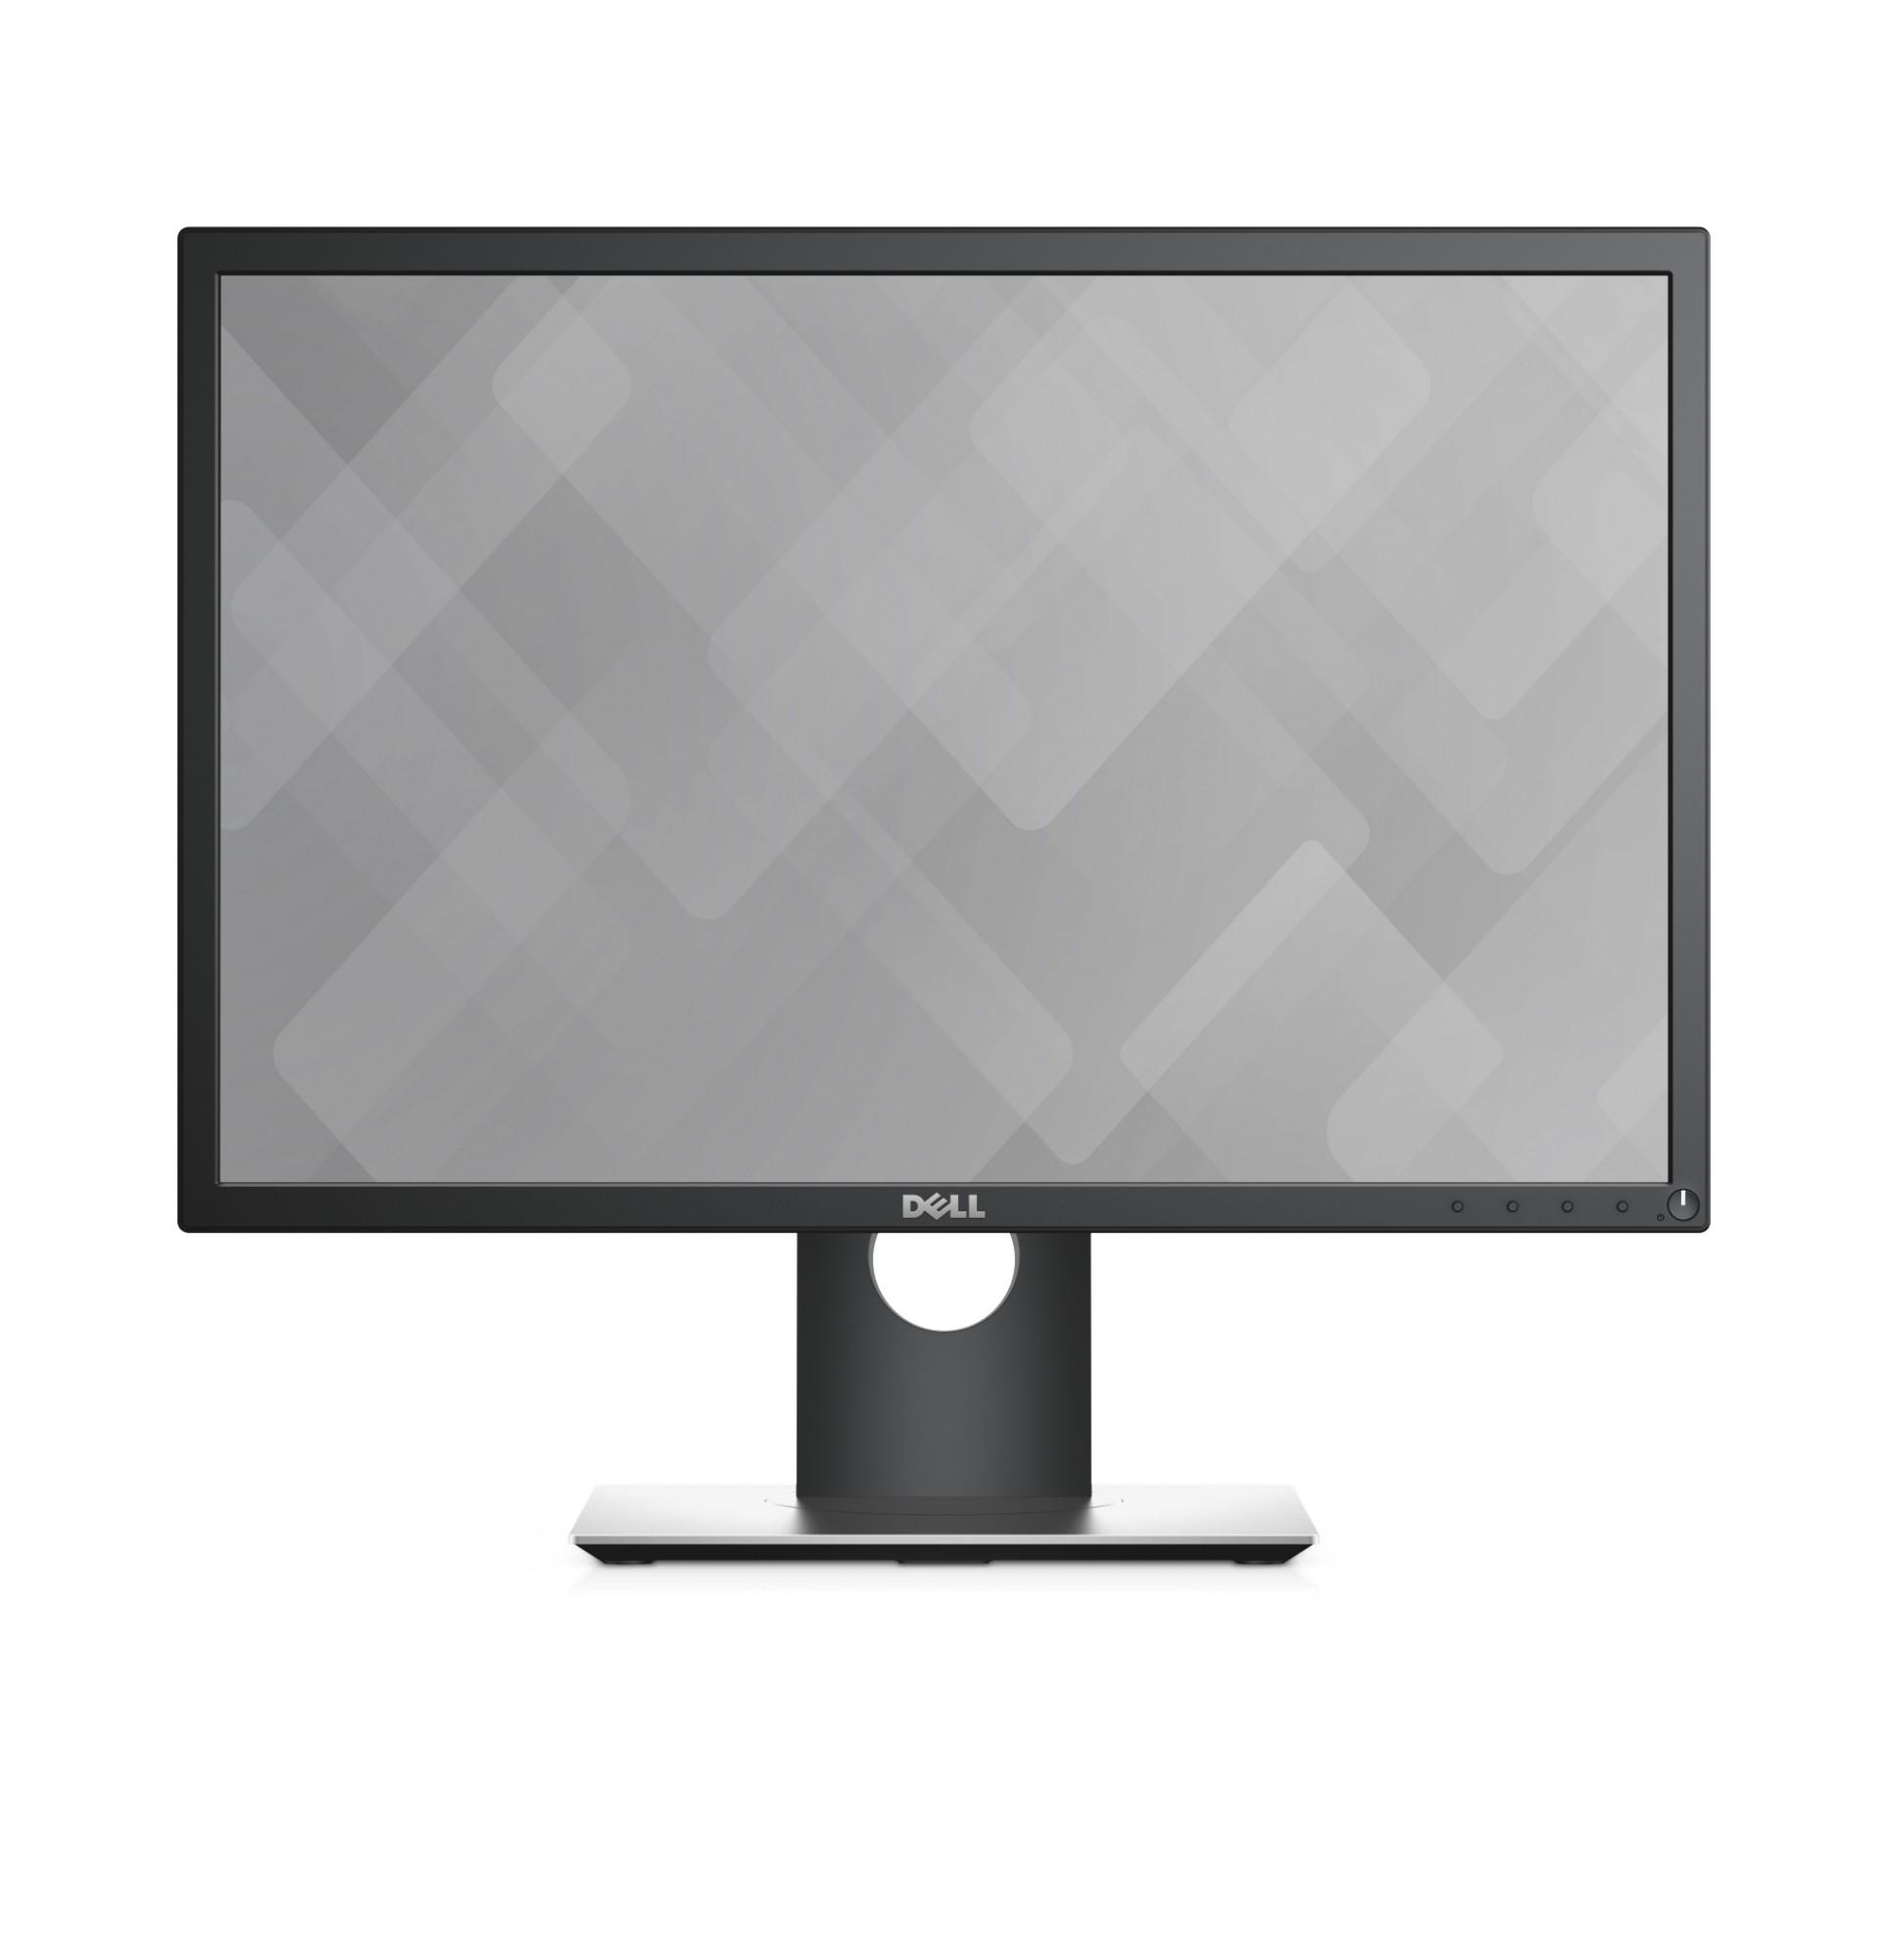 "DELL P2217 LED display 55.9 cm (22"") 1680 x 1050 pixels WSXGA+ LCD Black"